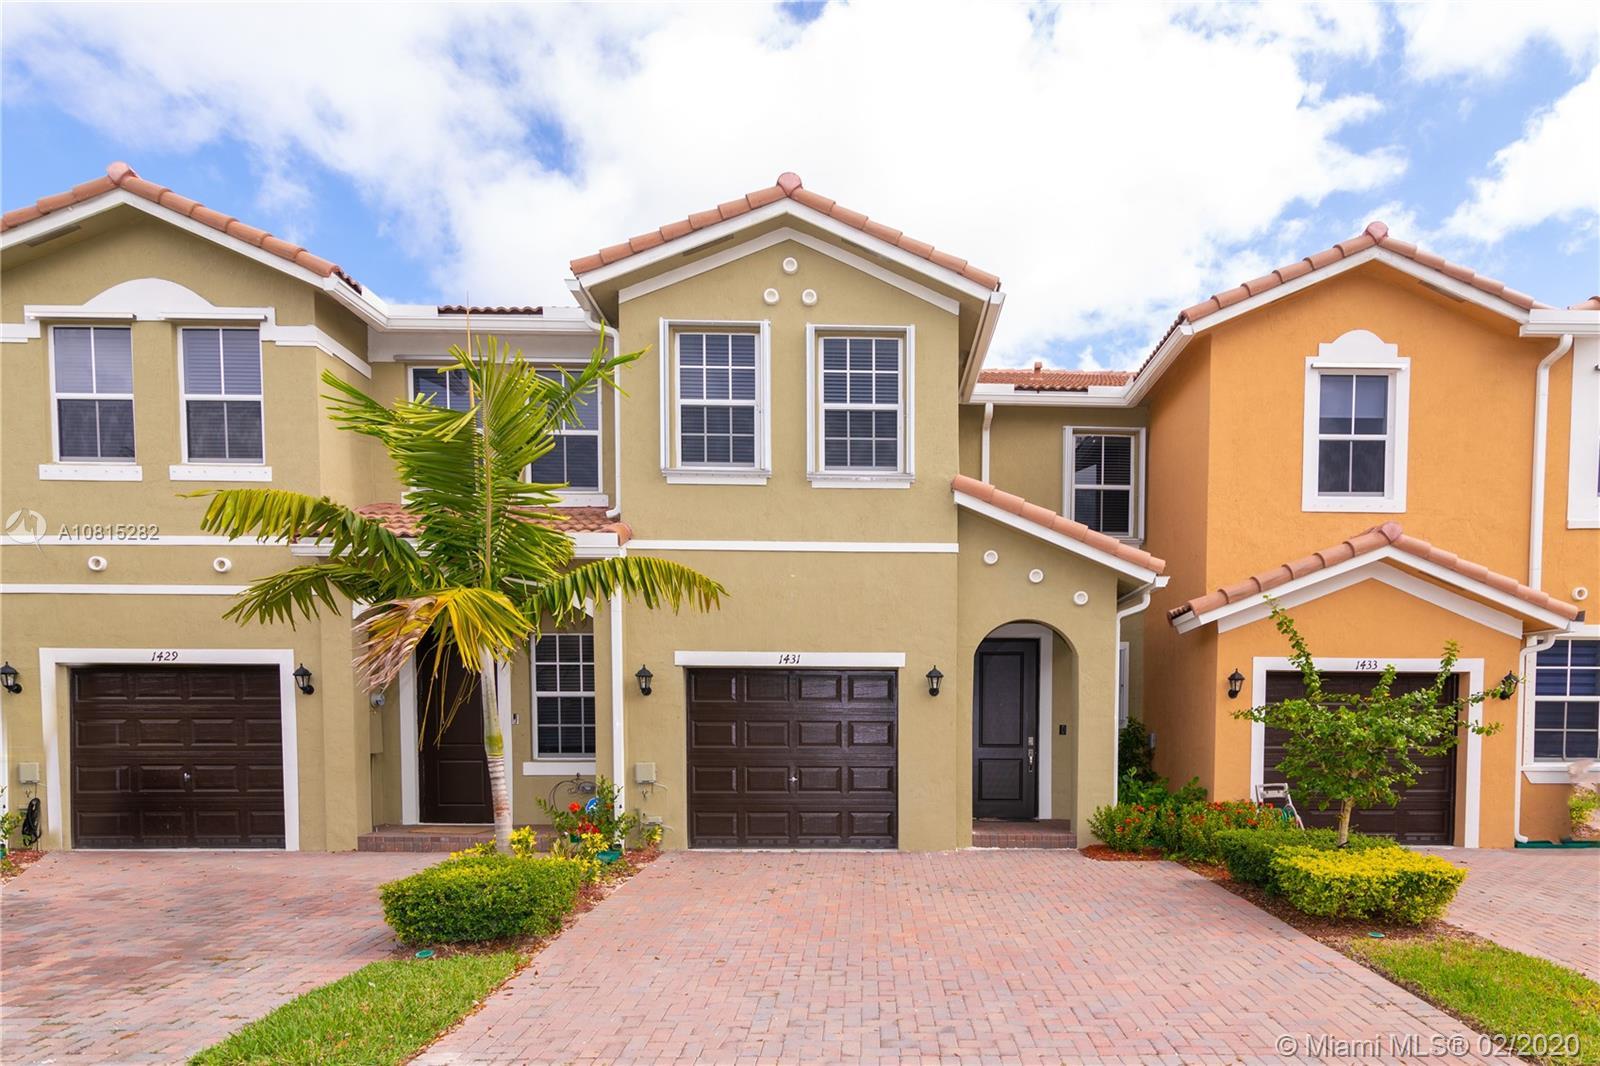 1431 SE 26th Ave #1431, Homestead, FL 33035 - Homestead, FL real estate listing